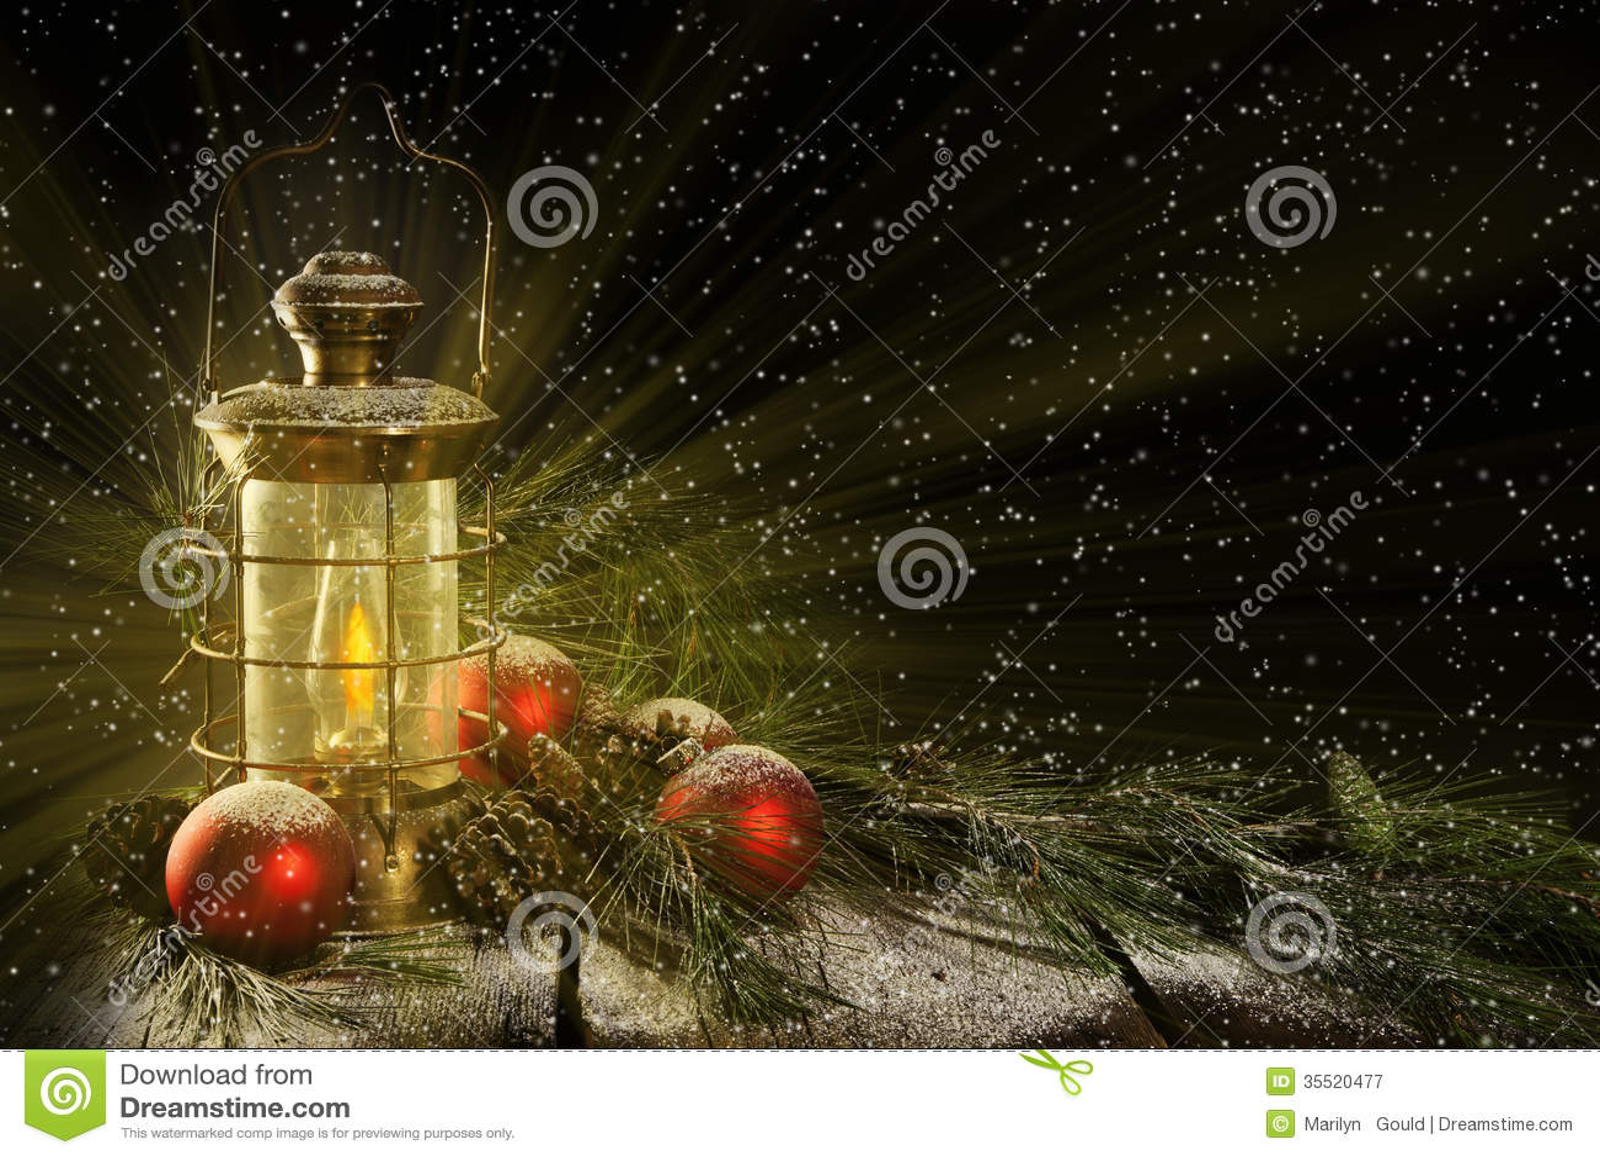 Glowing Lantern Christmas Night